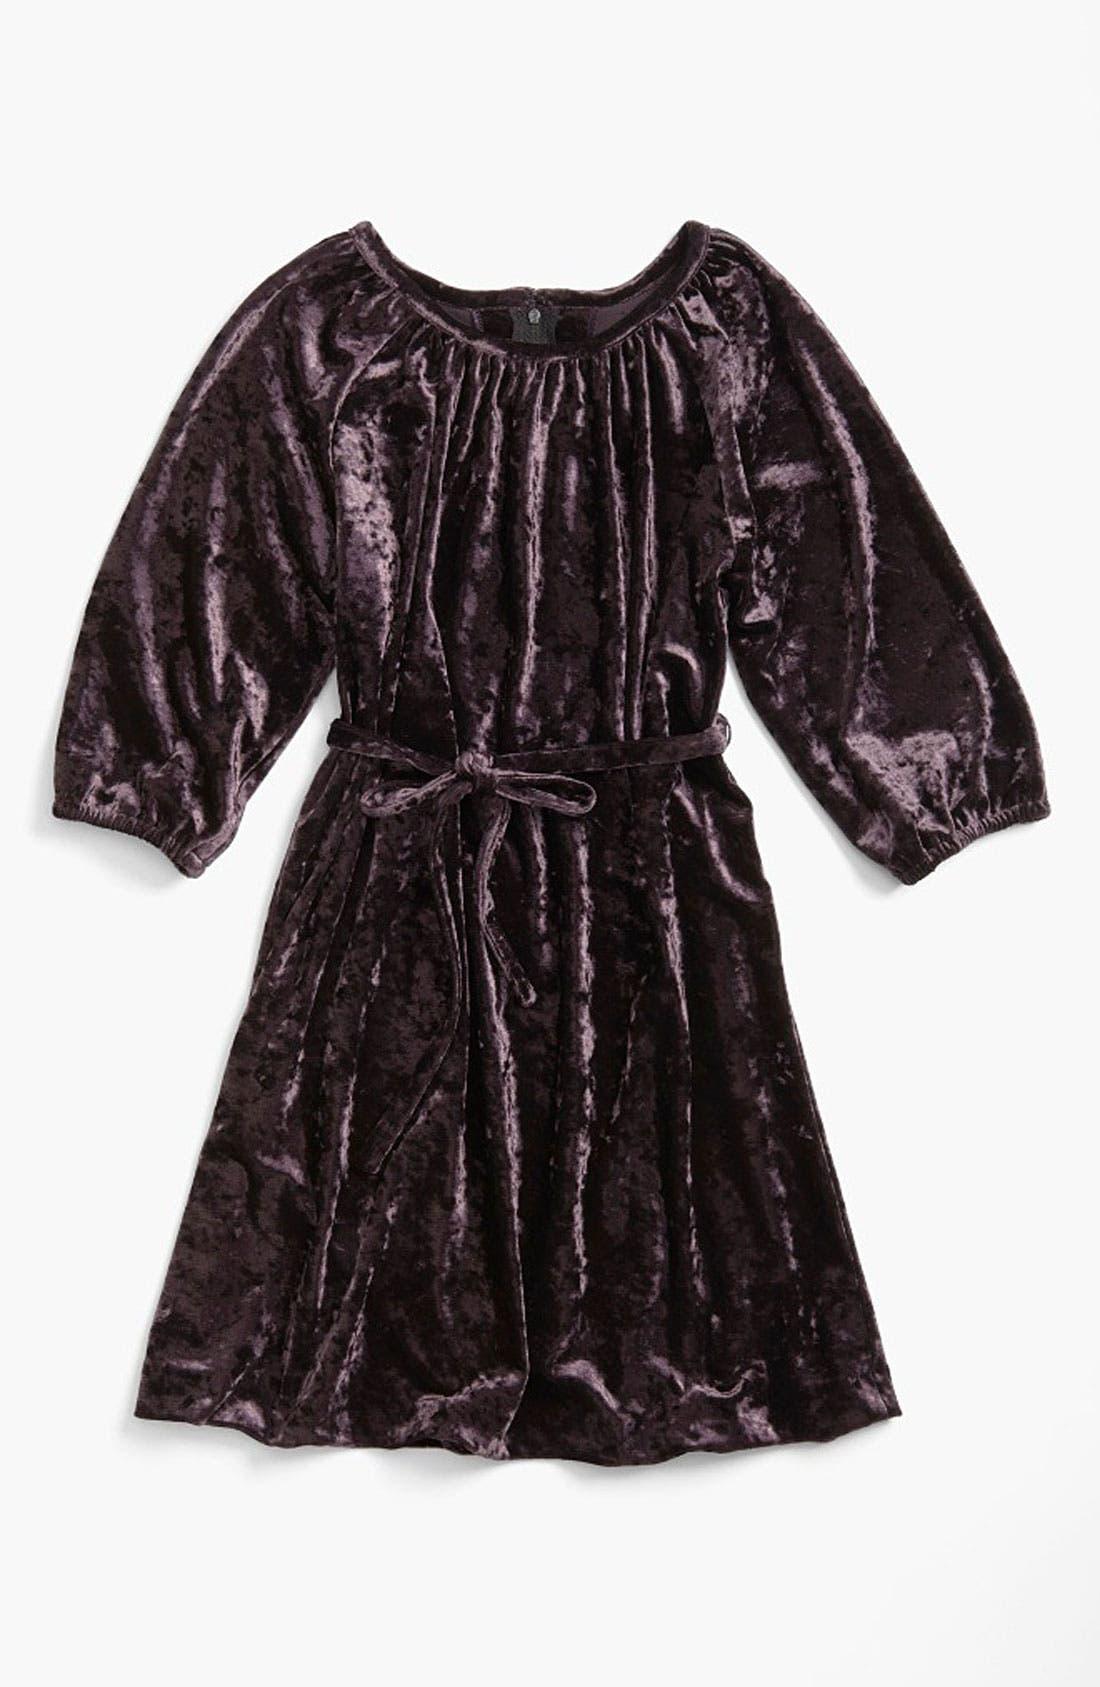 Alternate Image 1 Selected - Peek 'Norma' Dress (Toddler, Little Girls & Big Girls)